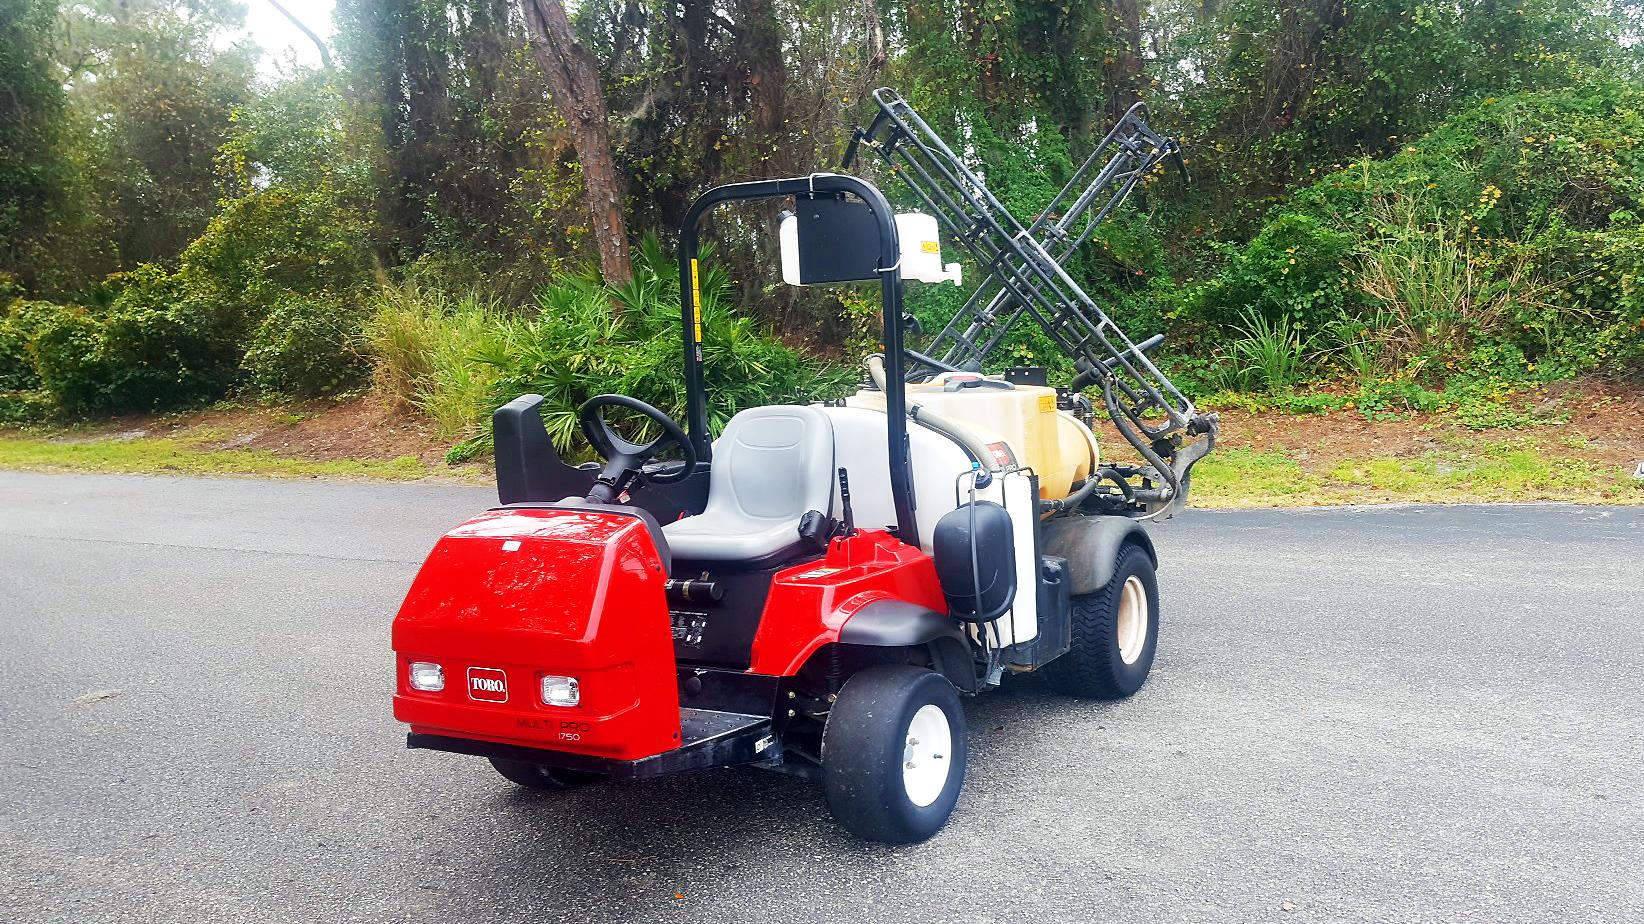 Toro Multi Pro 1750